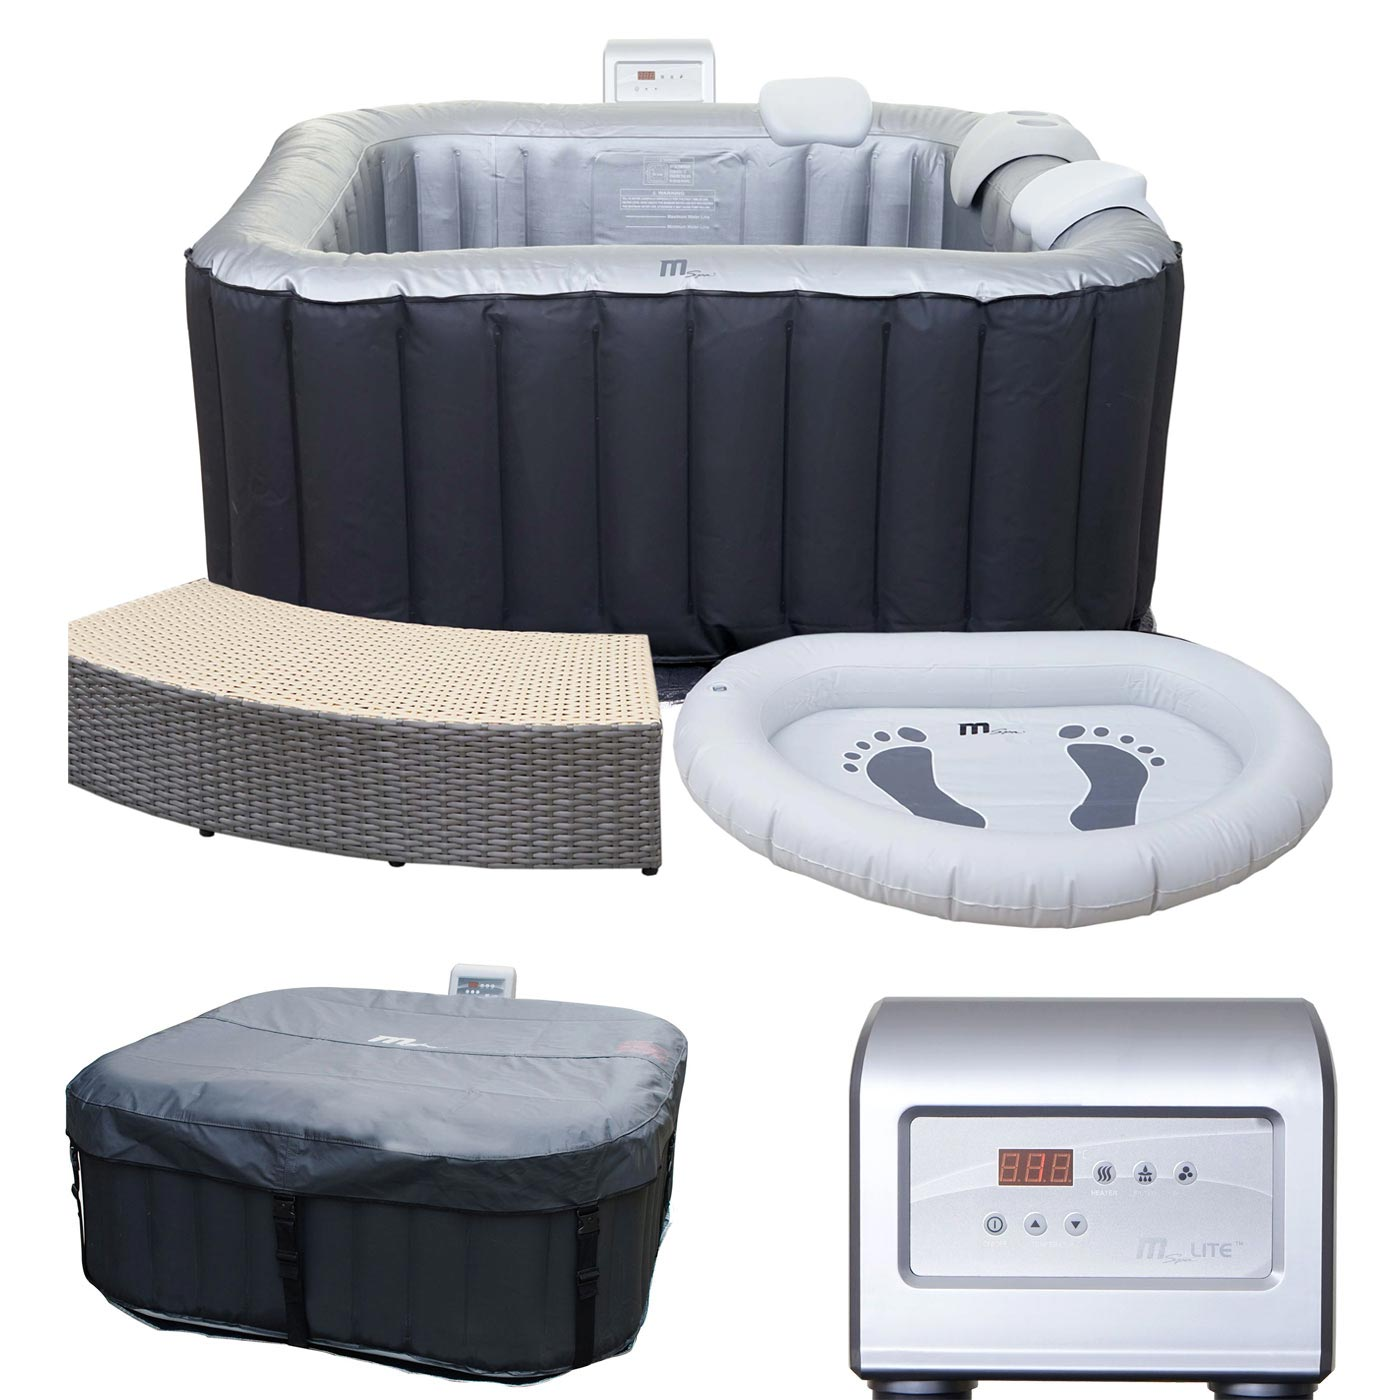 whirlpool mspa hwc a62 2 2 personen in outdoor heizbar aufblasbar 158x158cm ebay. Black Bedroom Furniture Sets. Home Design Ideas